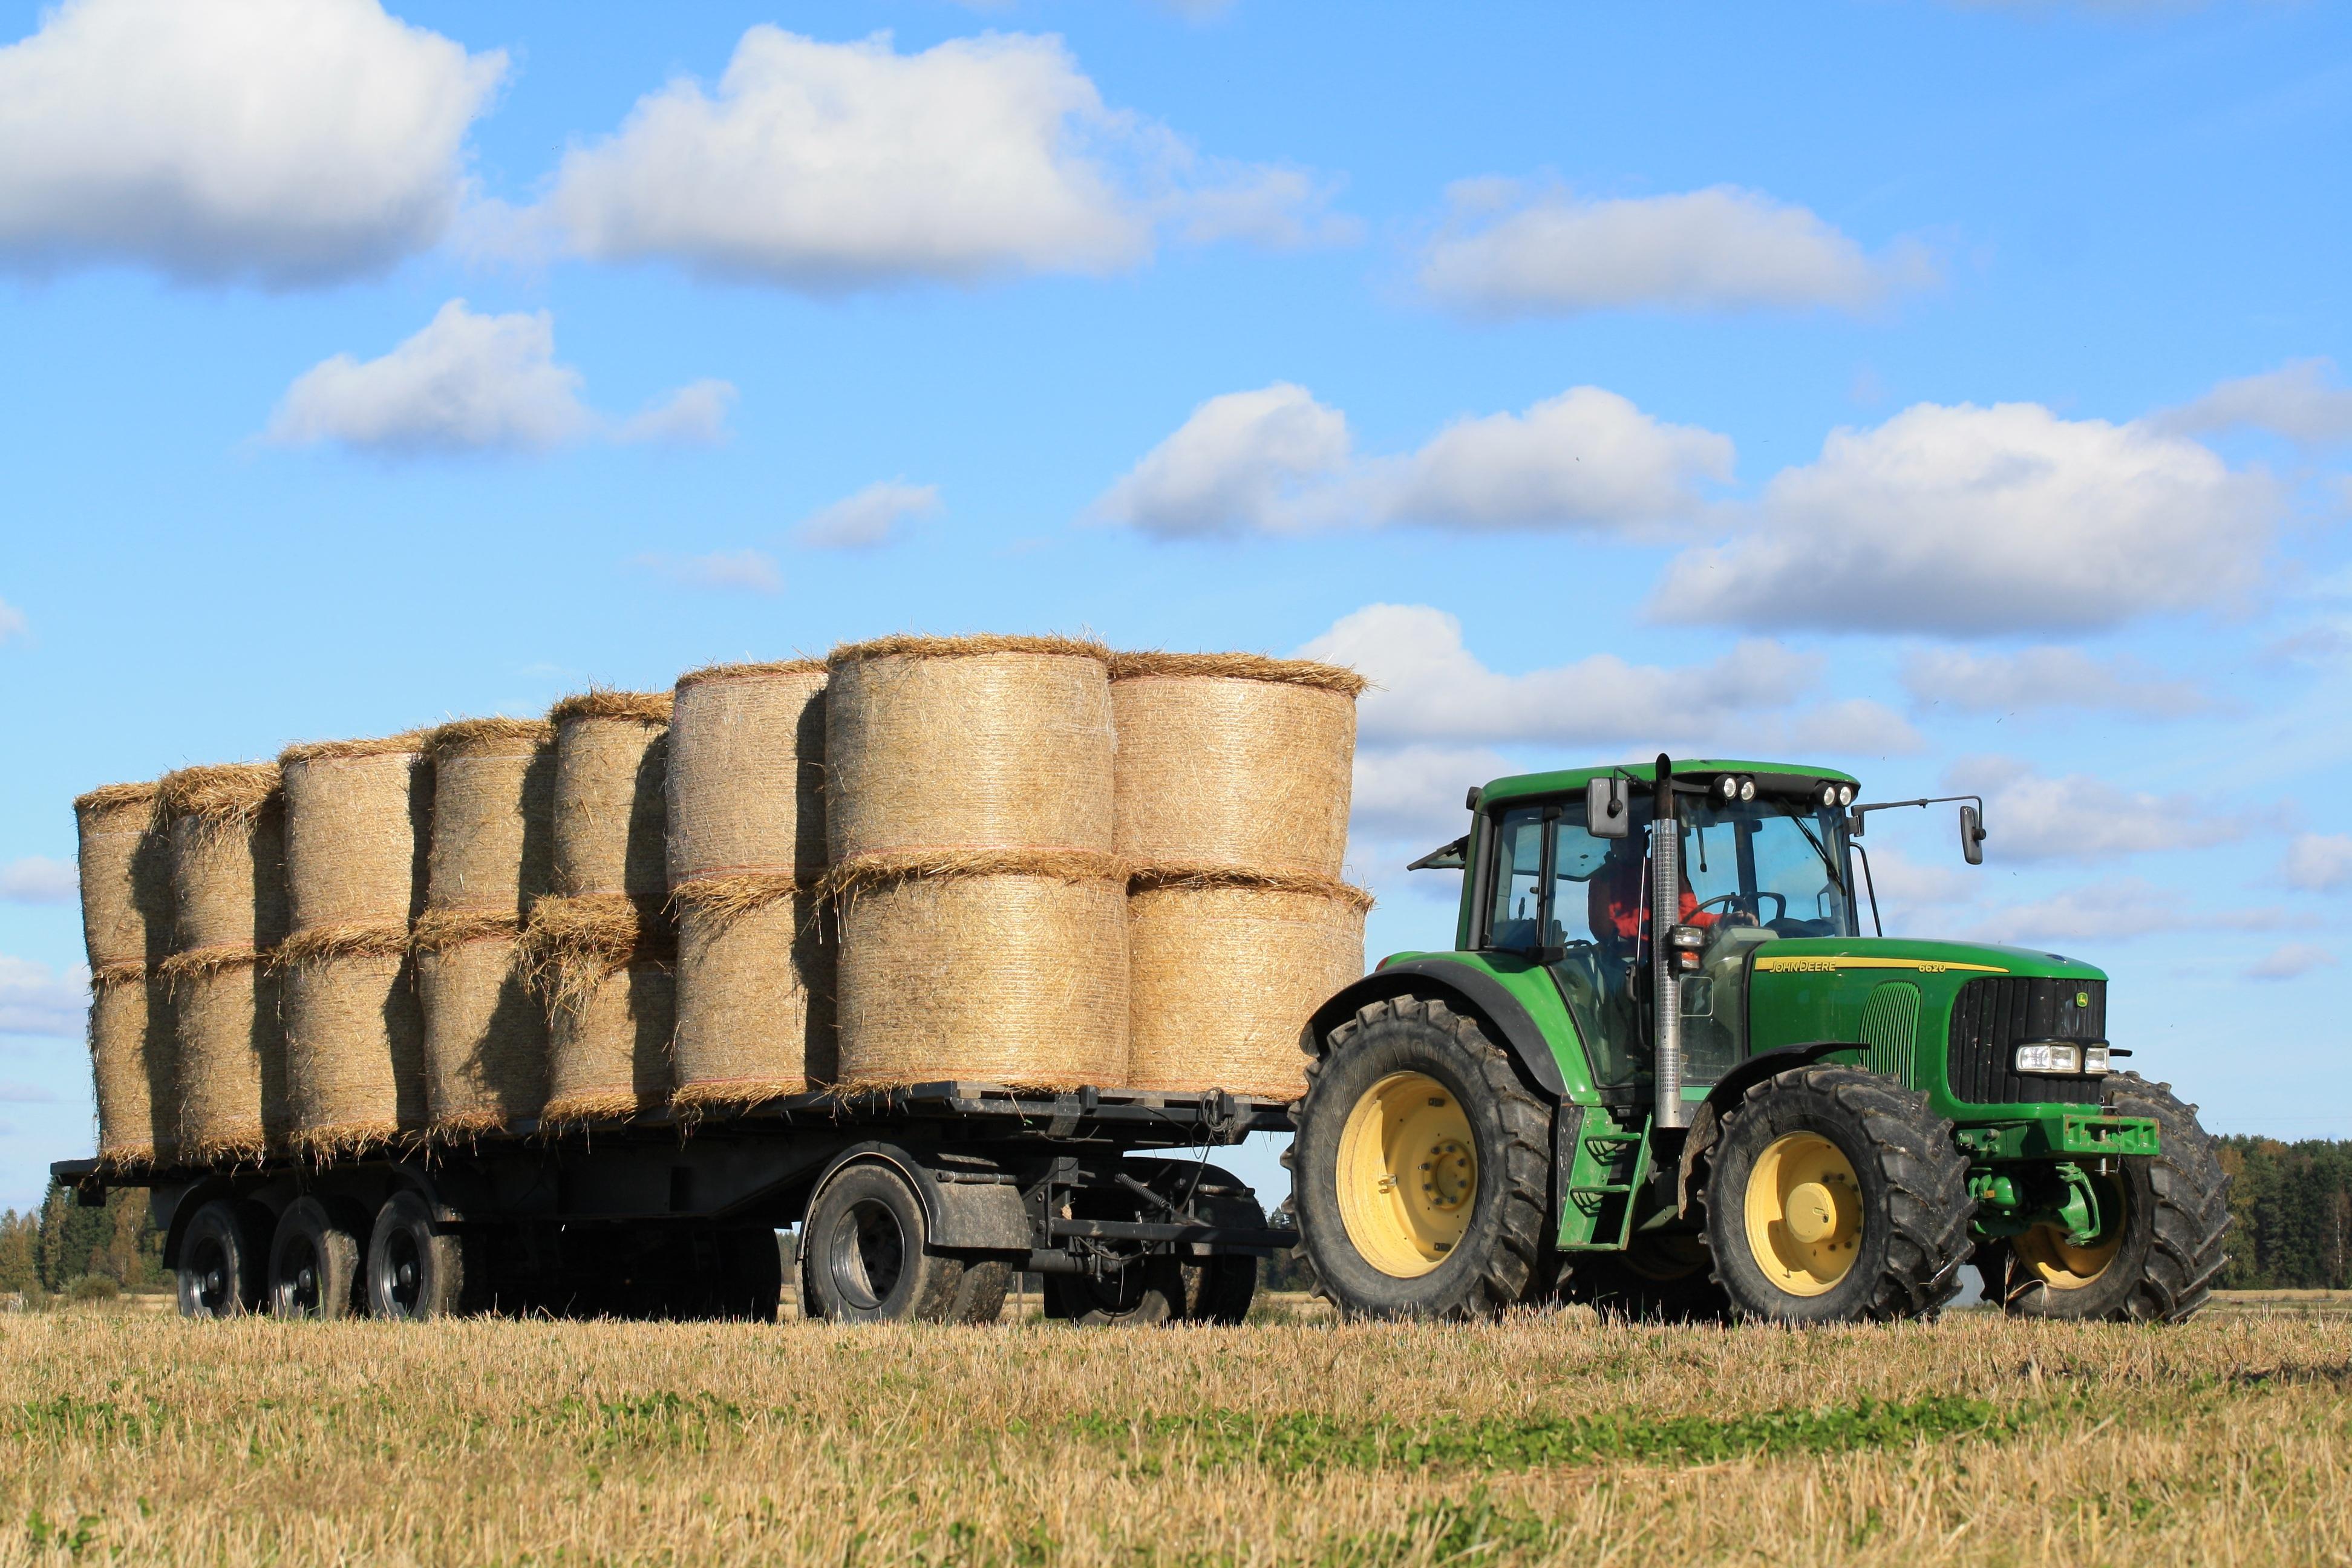 Kostenlose foto : Heu, Traktor, Feld, Bauernhof, Transport, Ernte ...